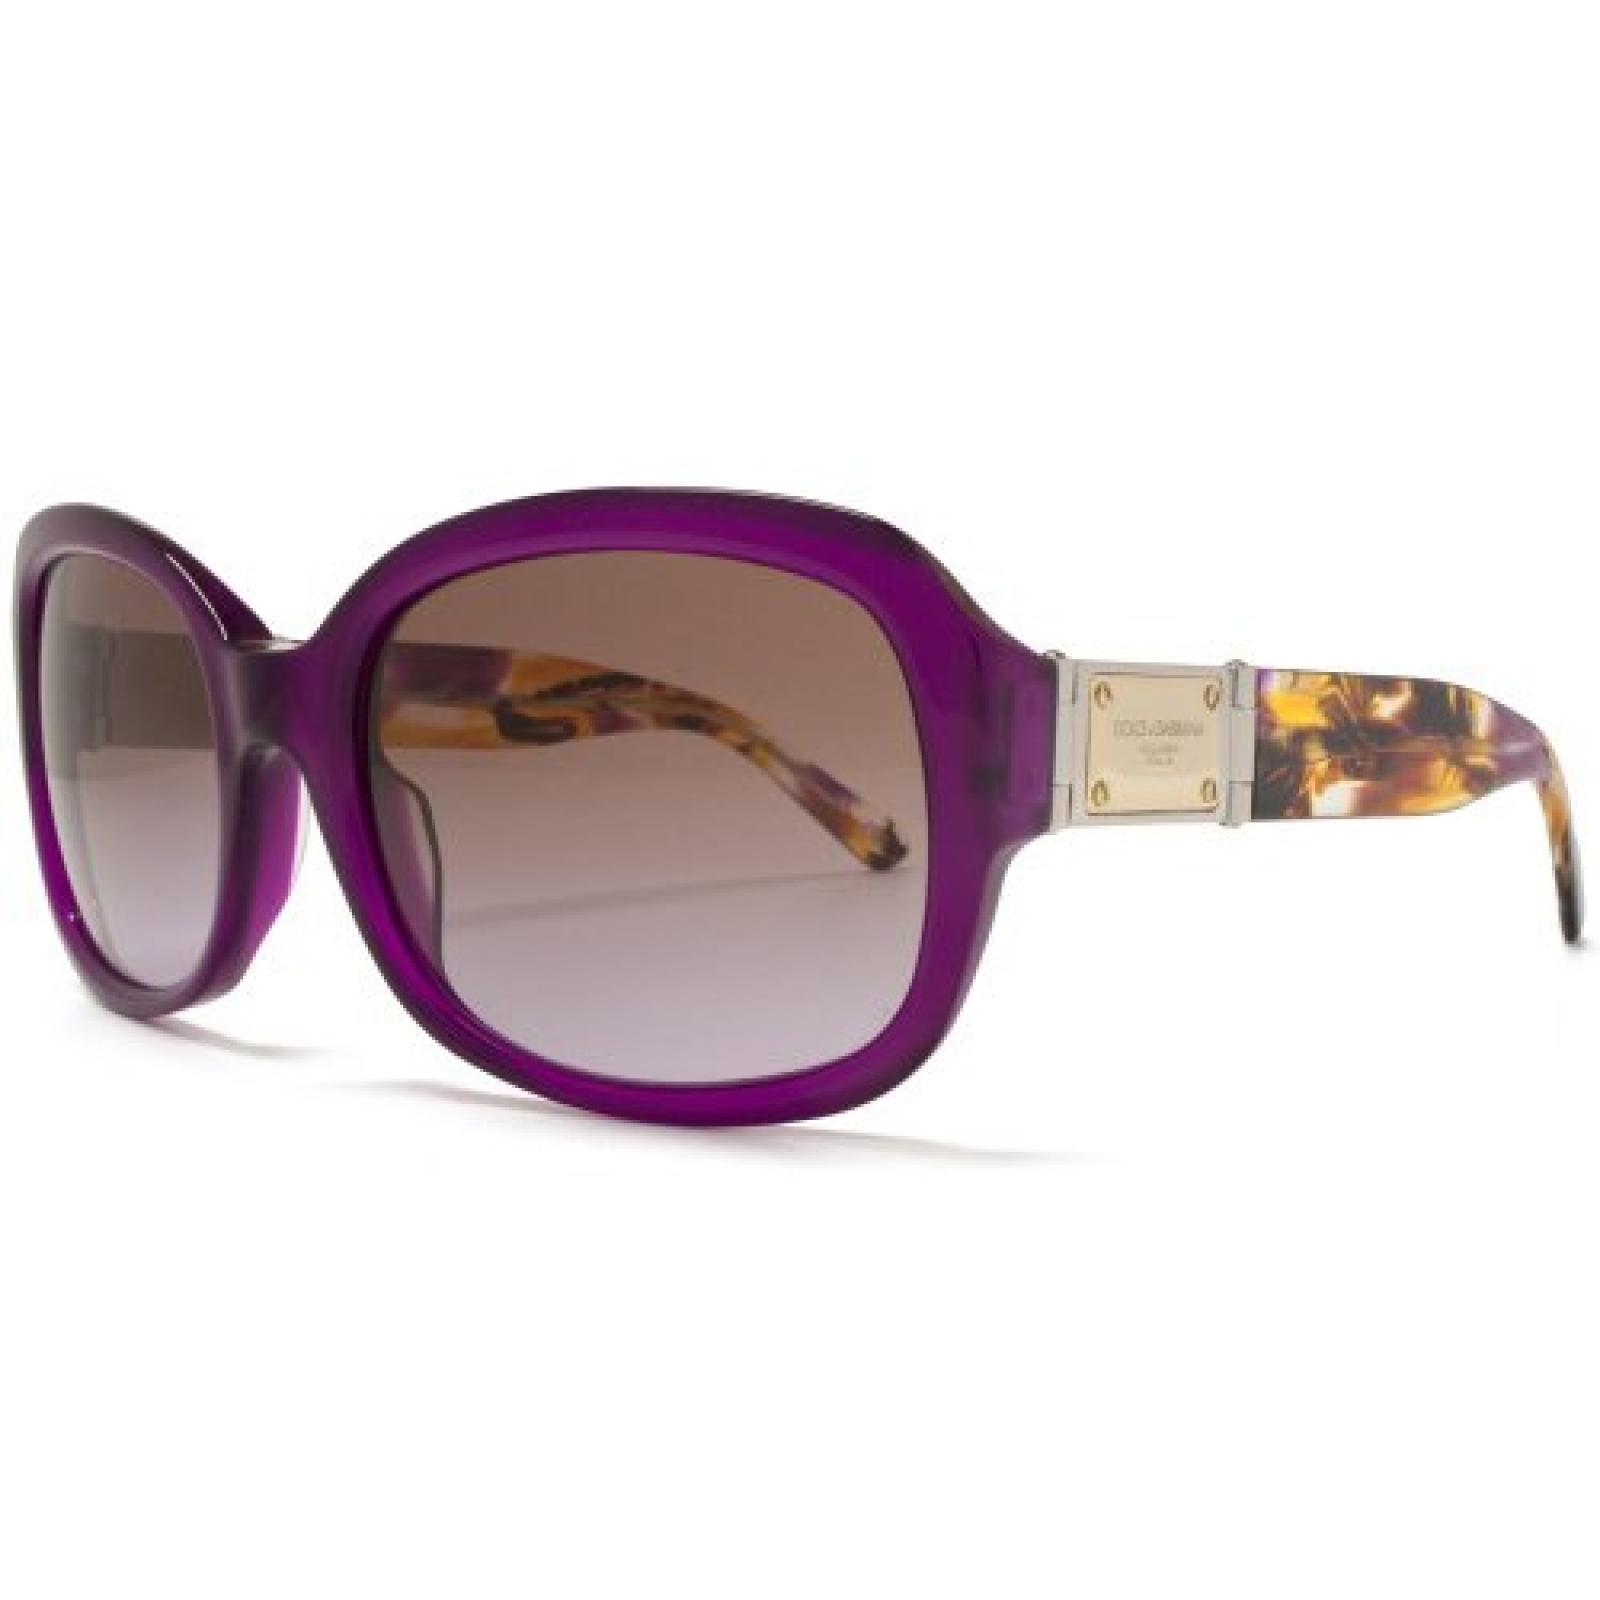 Dolce & Gabbana Classic Square Sunglasses Violet Brown 56 Violet Gradient